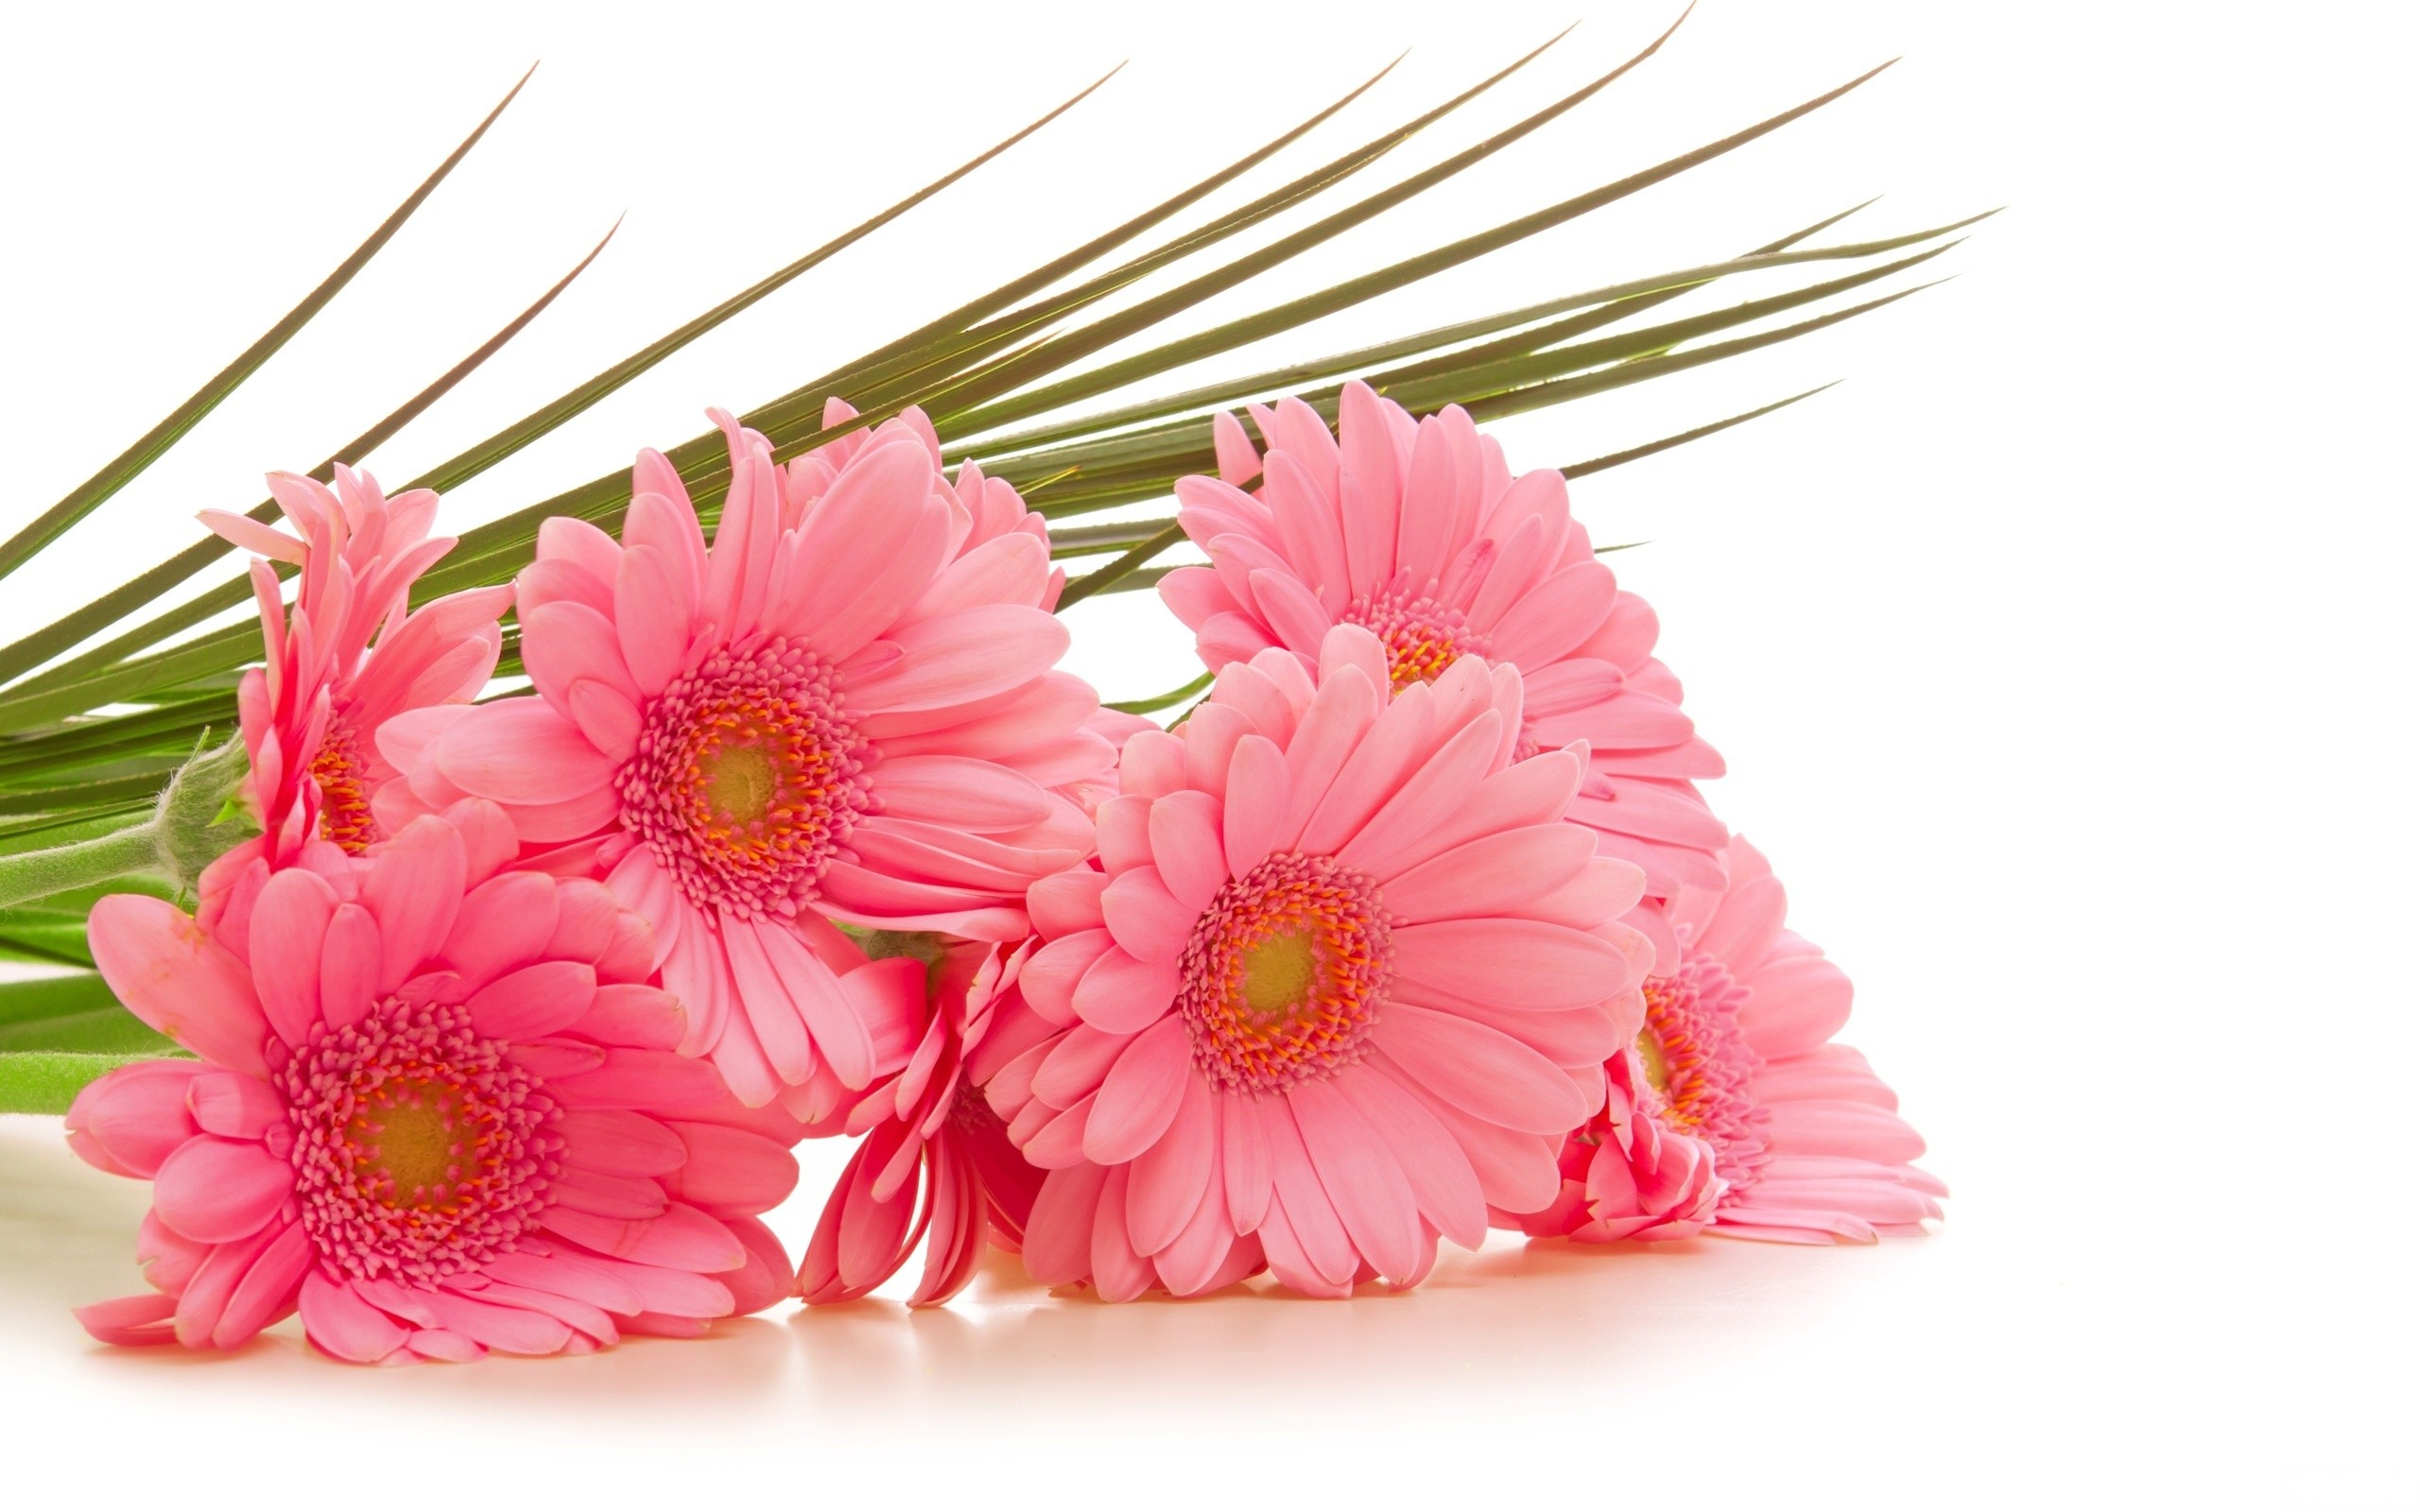 wallpaper.wiki-Pink-Flowers-Image-2560×1600-1-PIC-